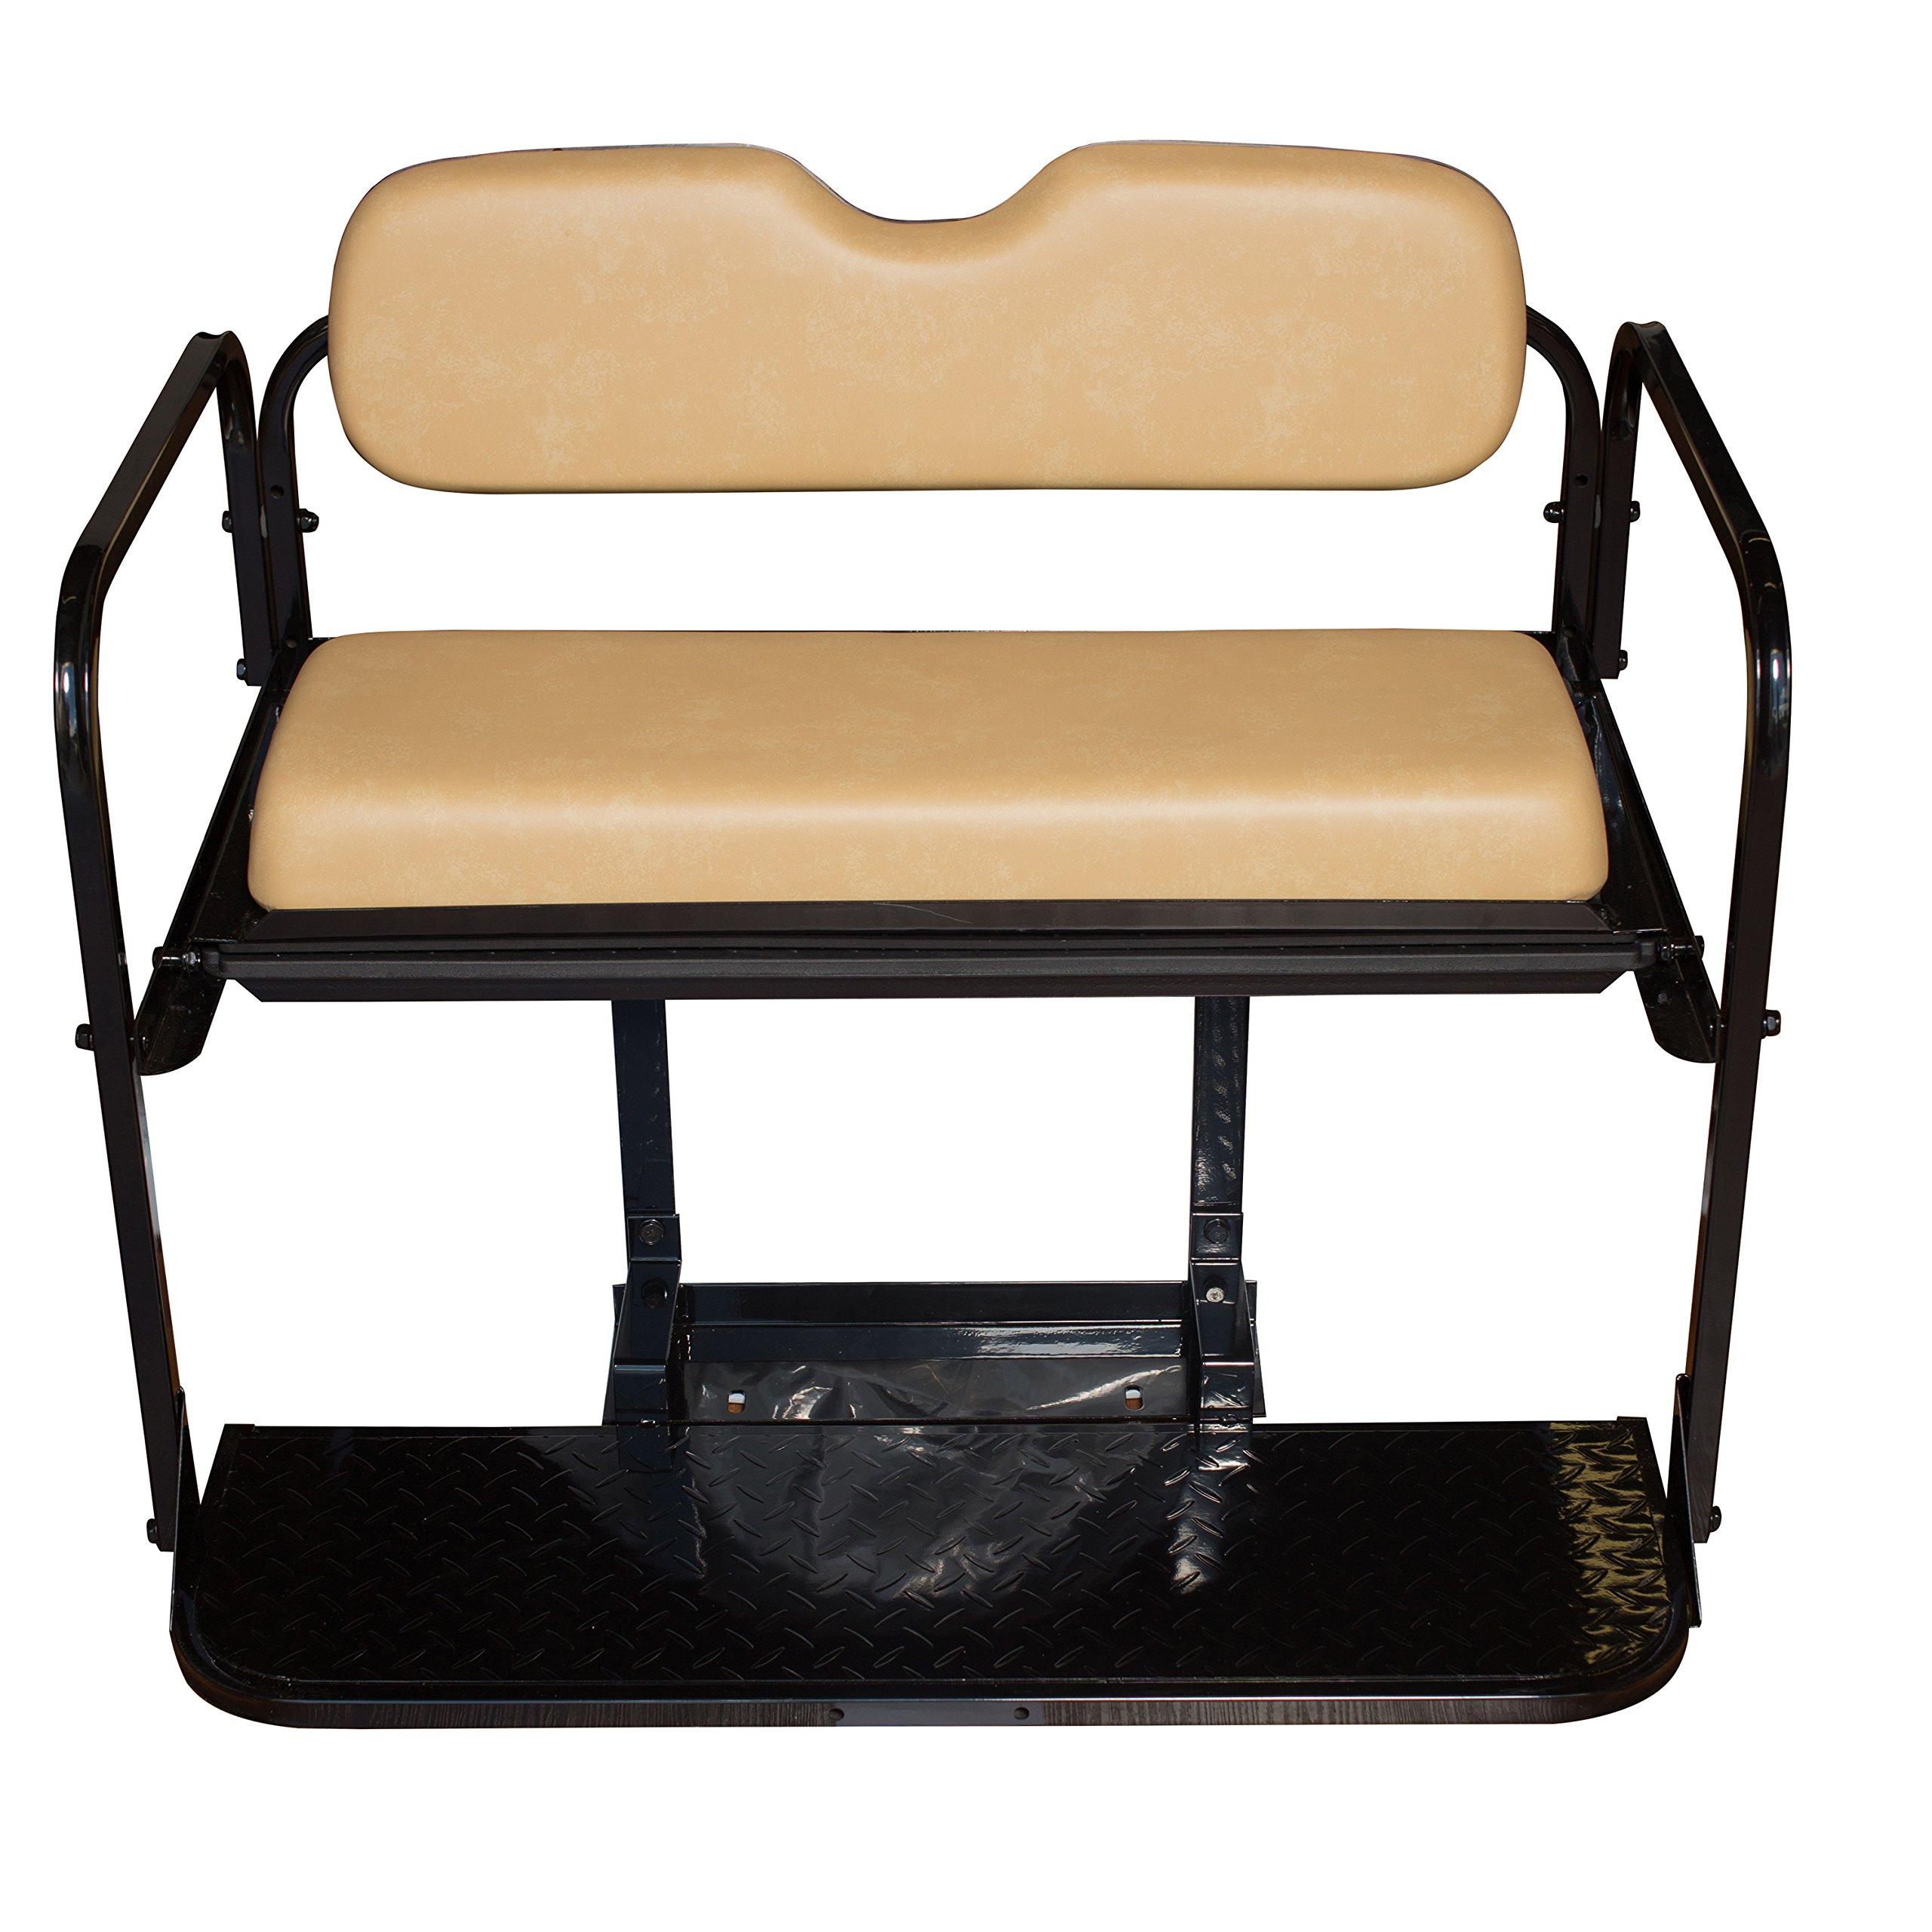 Golf Cart Rear Seat EZ-GO TXT Tan Cushions by Performance Plus Carts (Image #2)